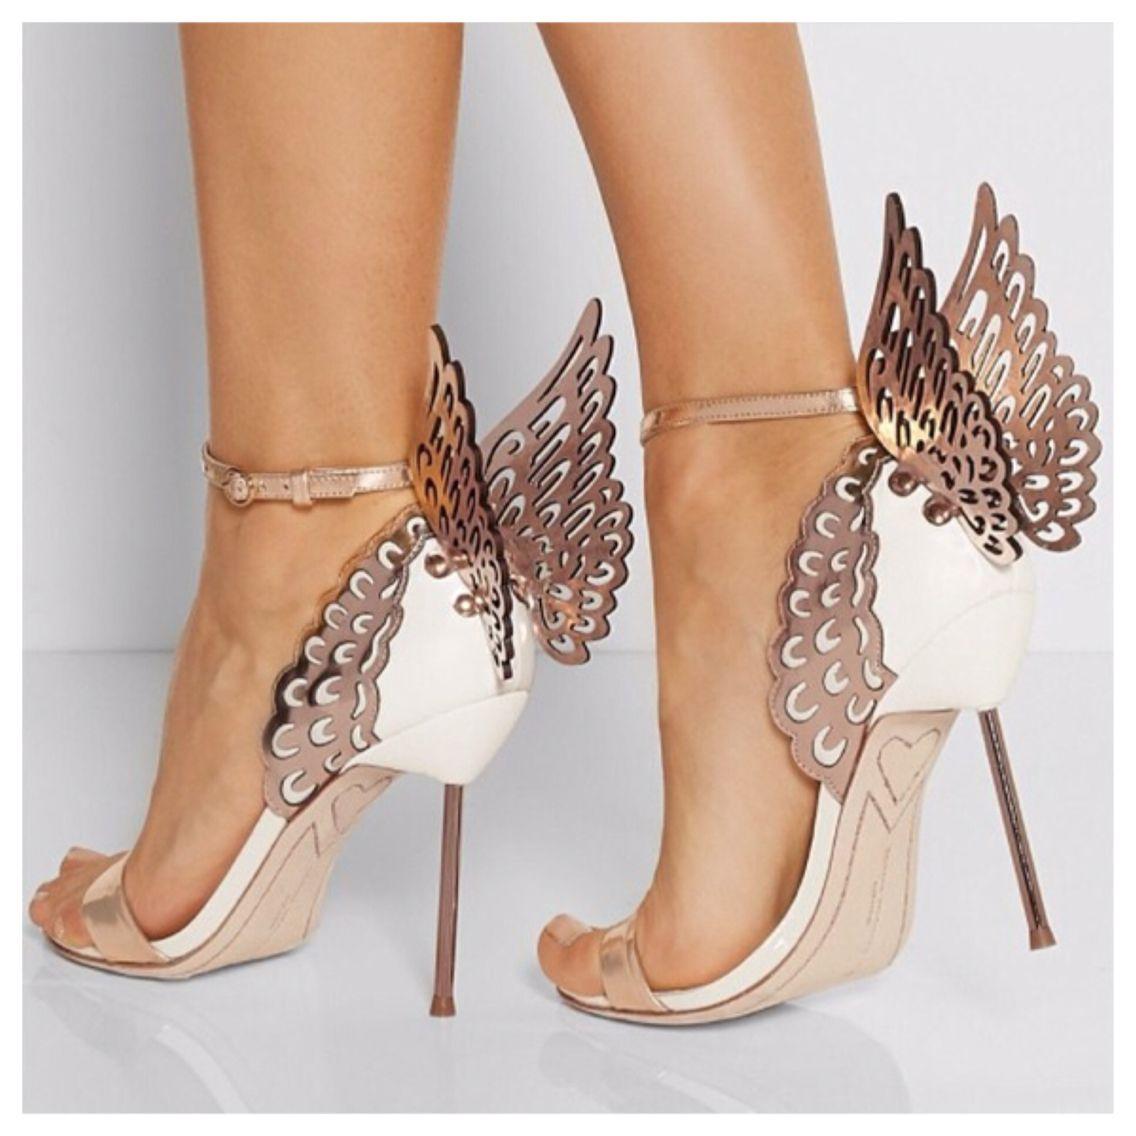 Sophia Webster rose gold butterfly